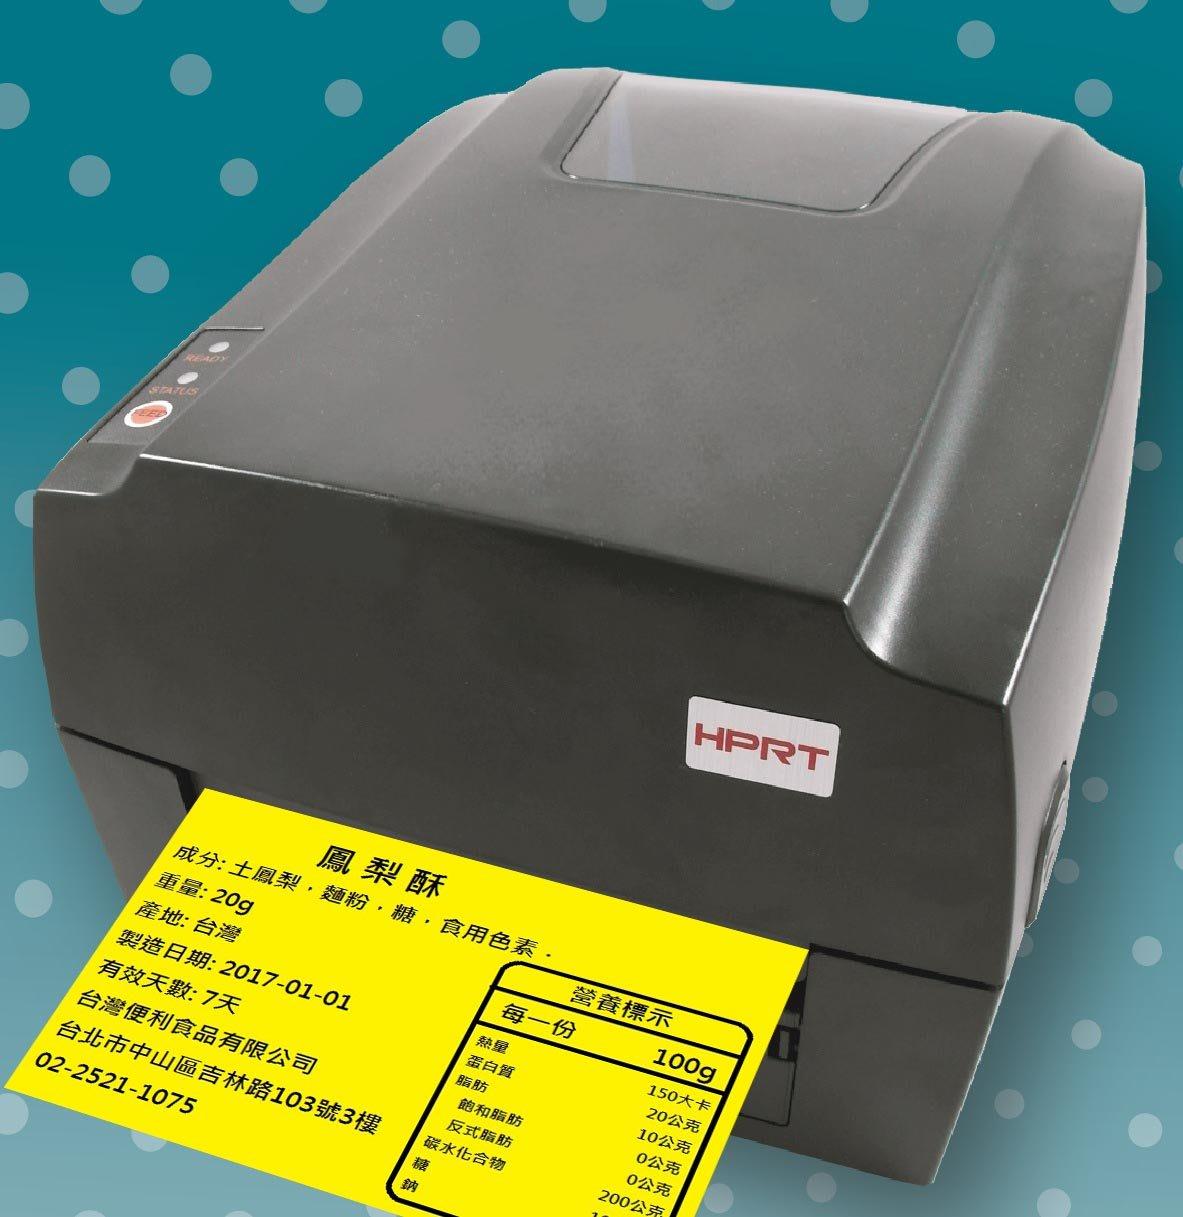 HPRT漢印 HT300標籤機&條碼機(網路型) (另售:QL-800/QL-810W/TTP-345/TTP-247)